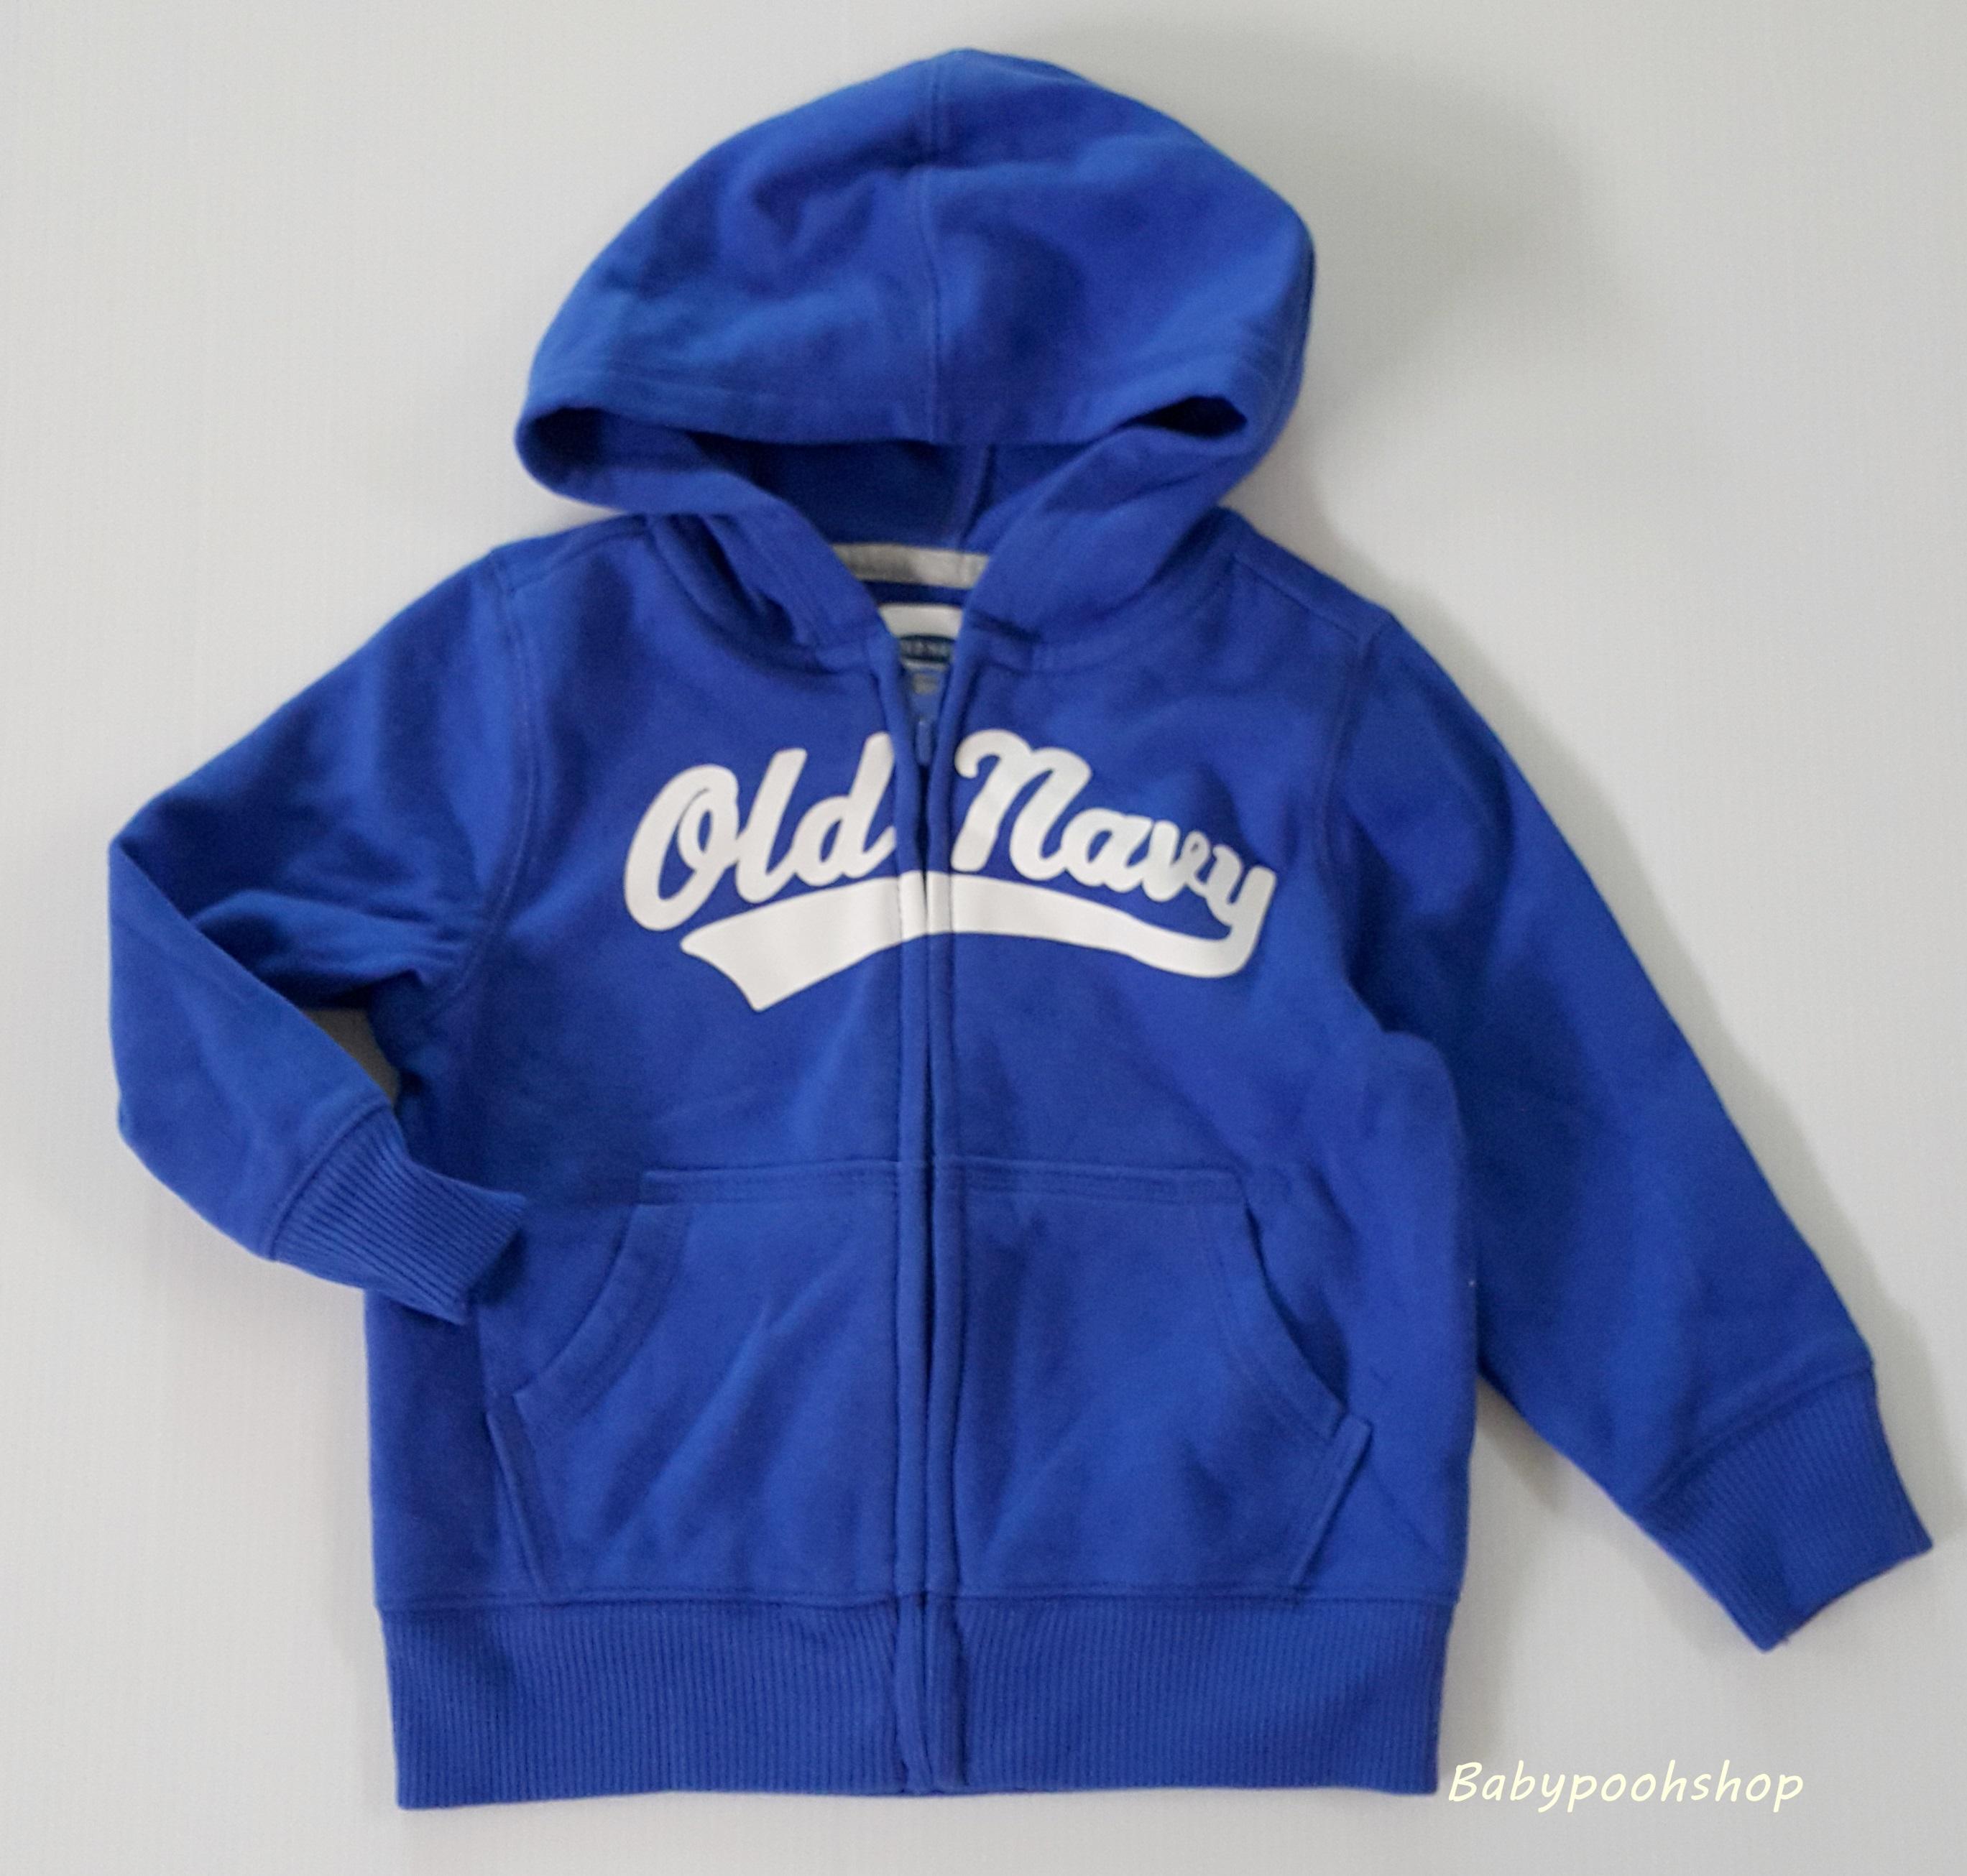 Old navy : เสื้อแจ็คเก็ทกันหนาว มีฮูด สีน้ำเงิน size 12-18m / 18-24m